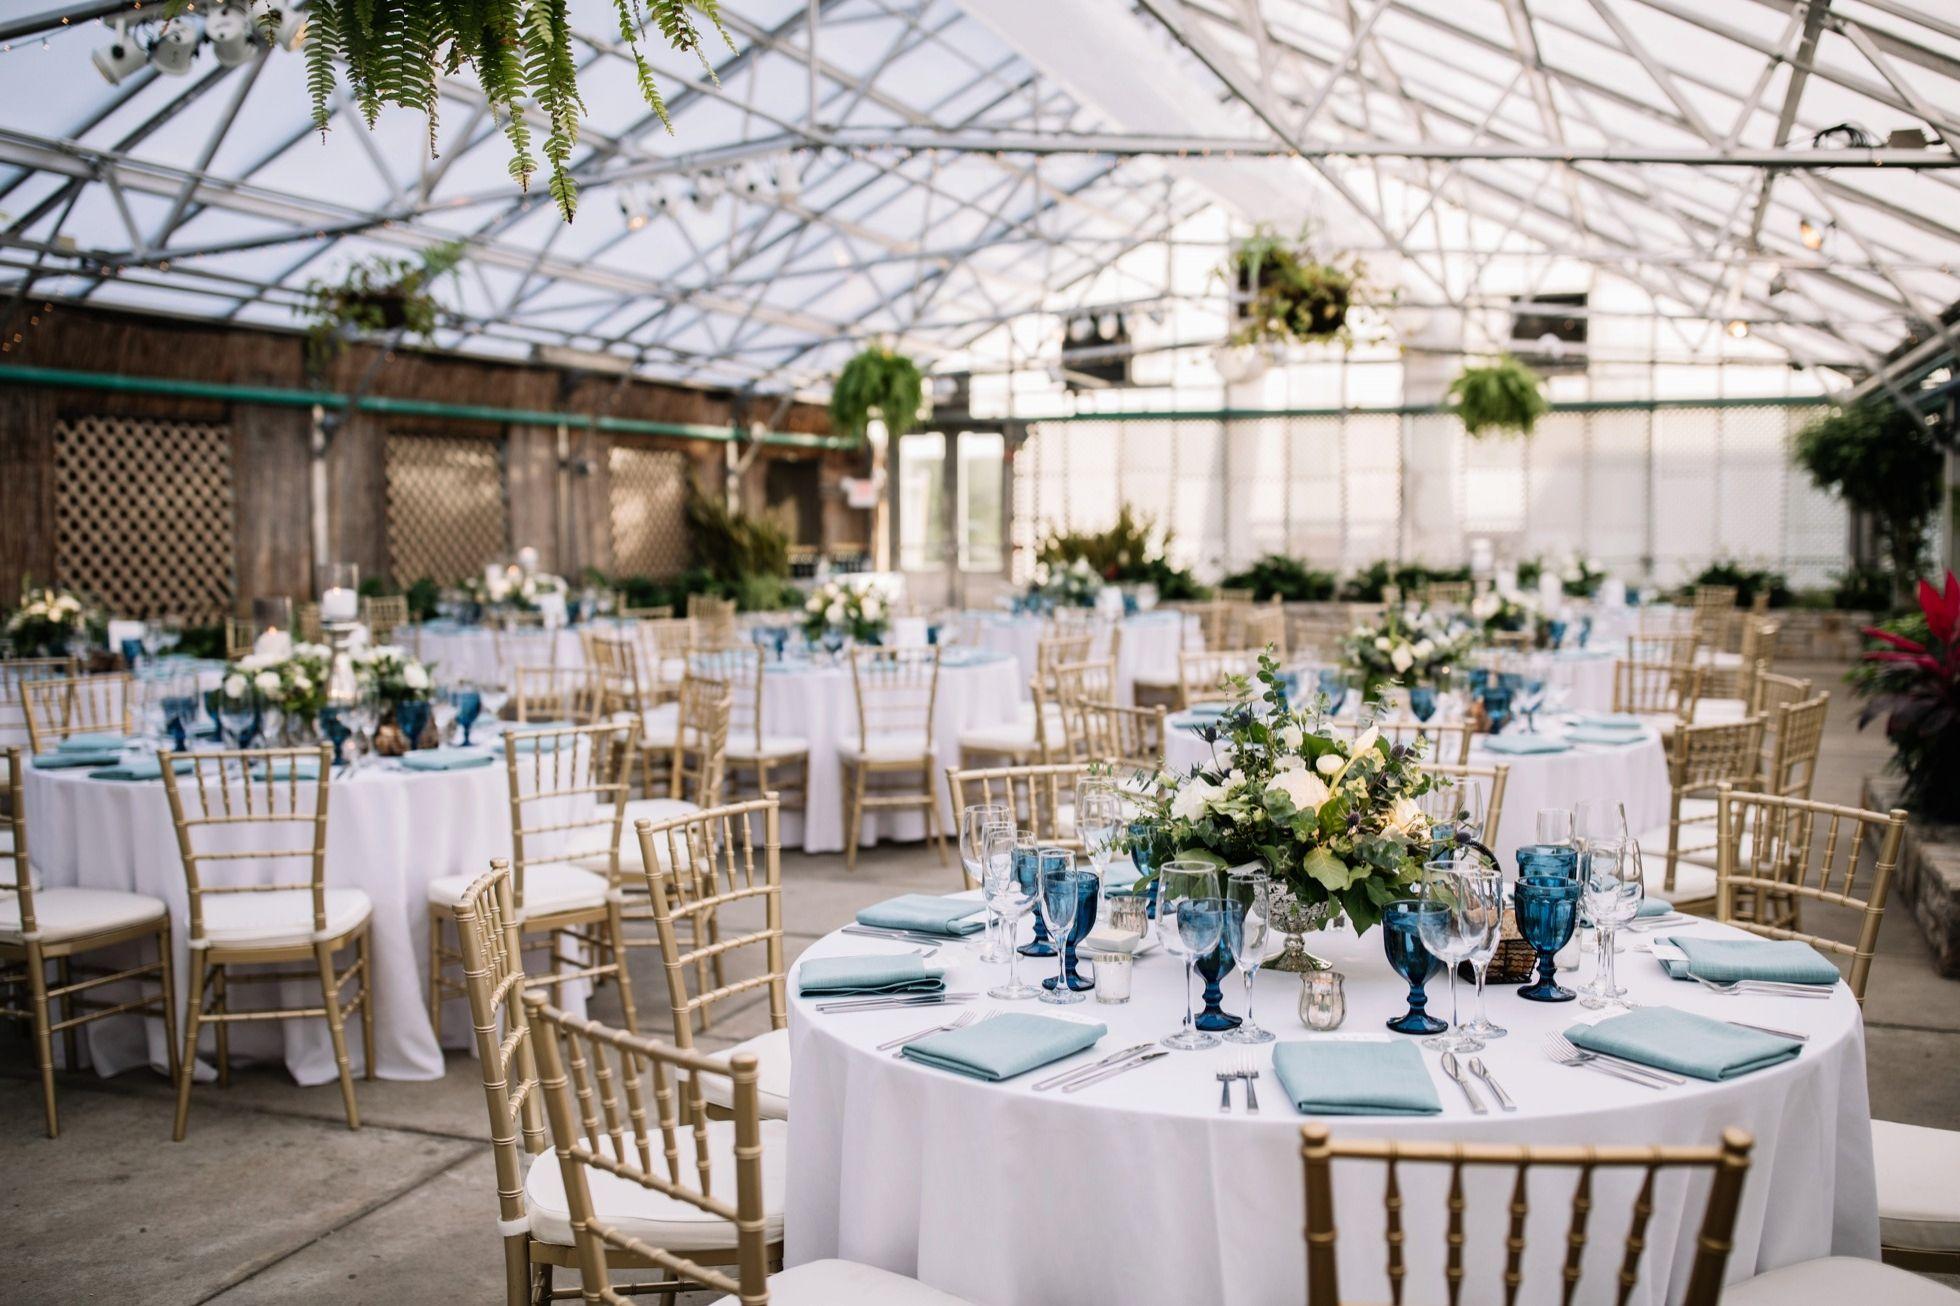 Best Unique Wedding Venues Philadelphia Fairmount Horticultural Center Greenhouse Philadelphia Wedding Venues Unique Wedding Venues Unusual Wedding Venues